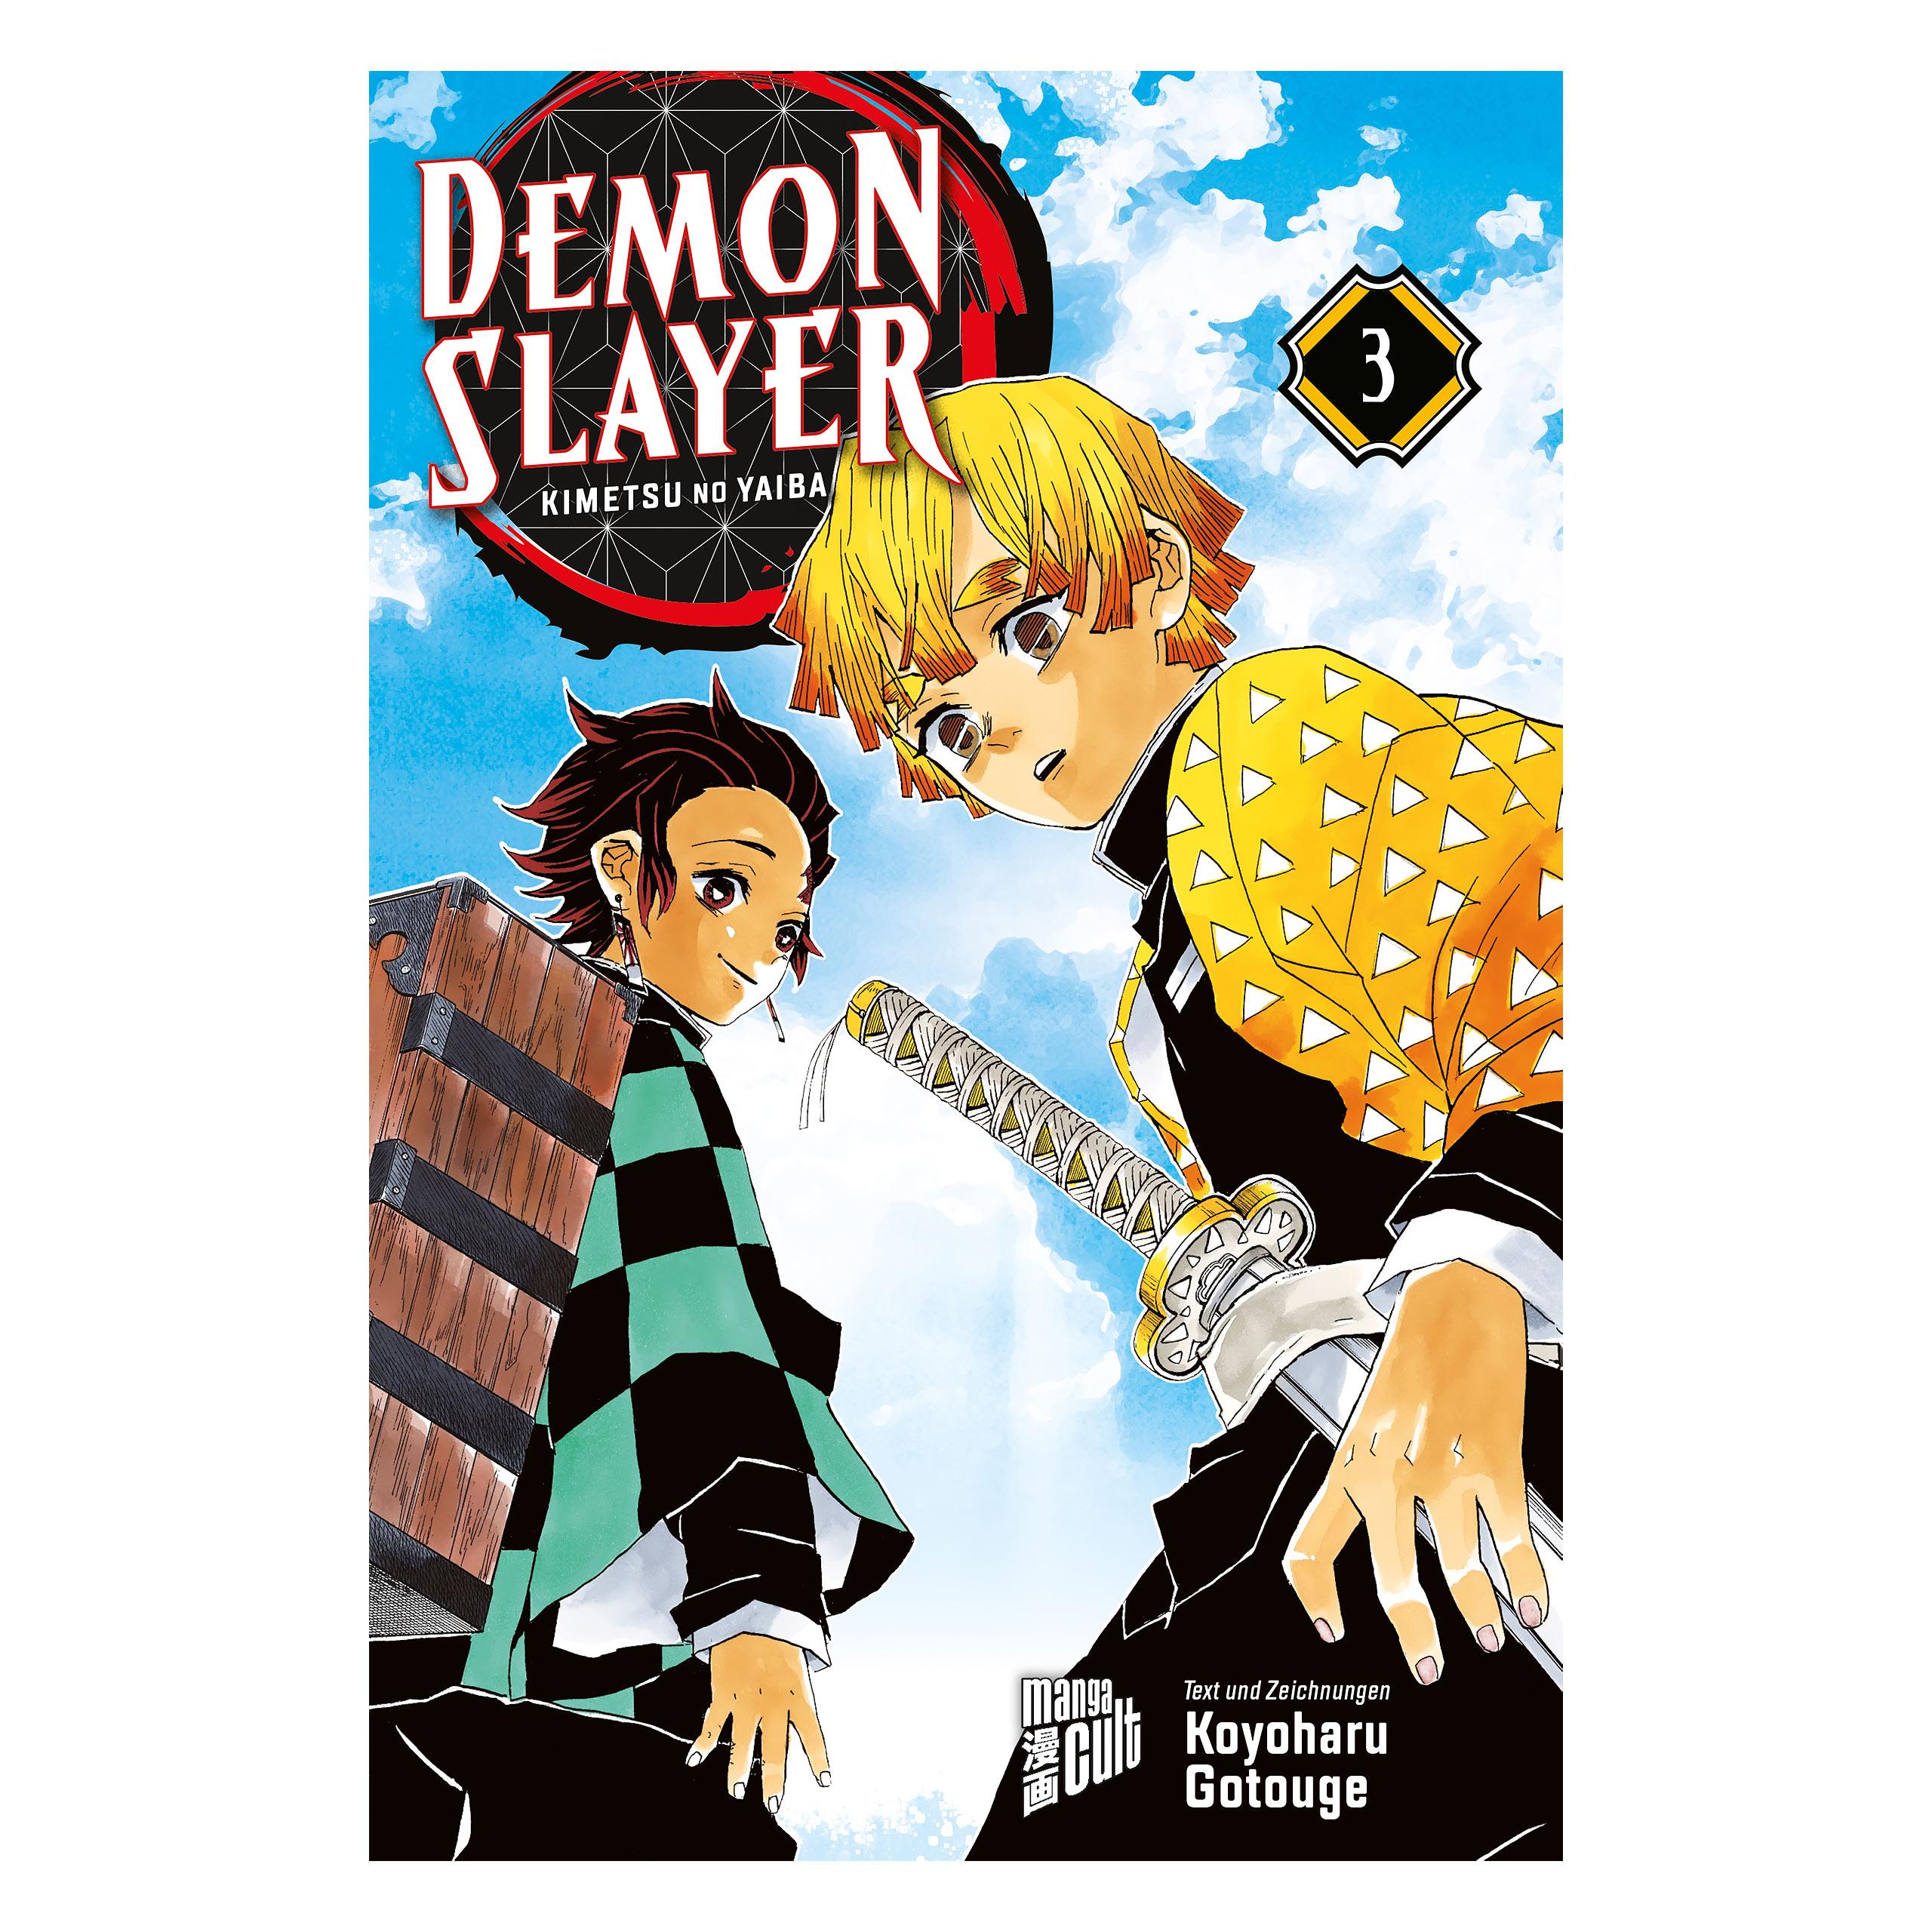 Demon Slayer - Kimetsu no yaiba Band 3 Taschenbuch